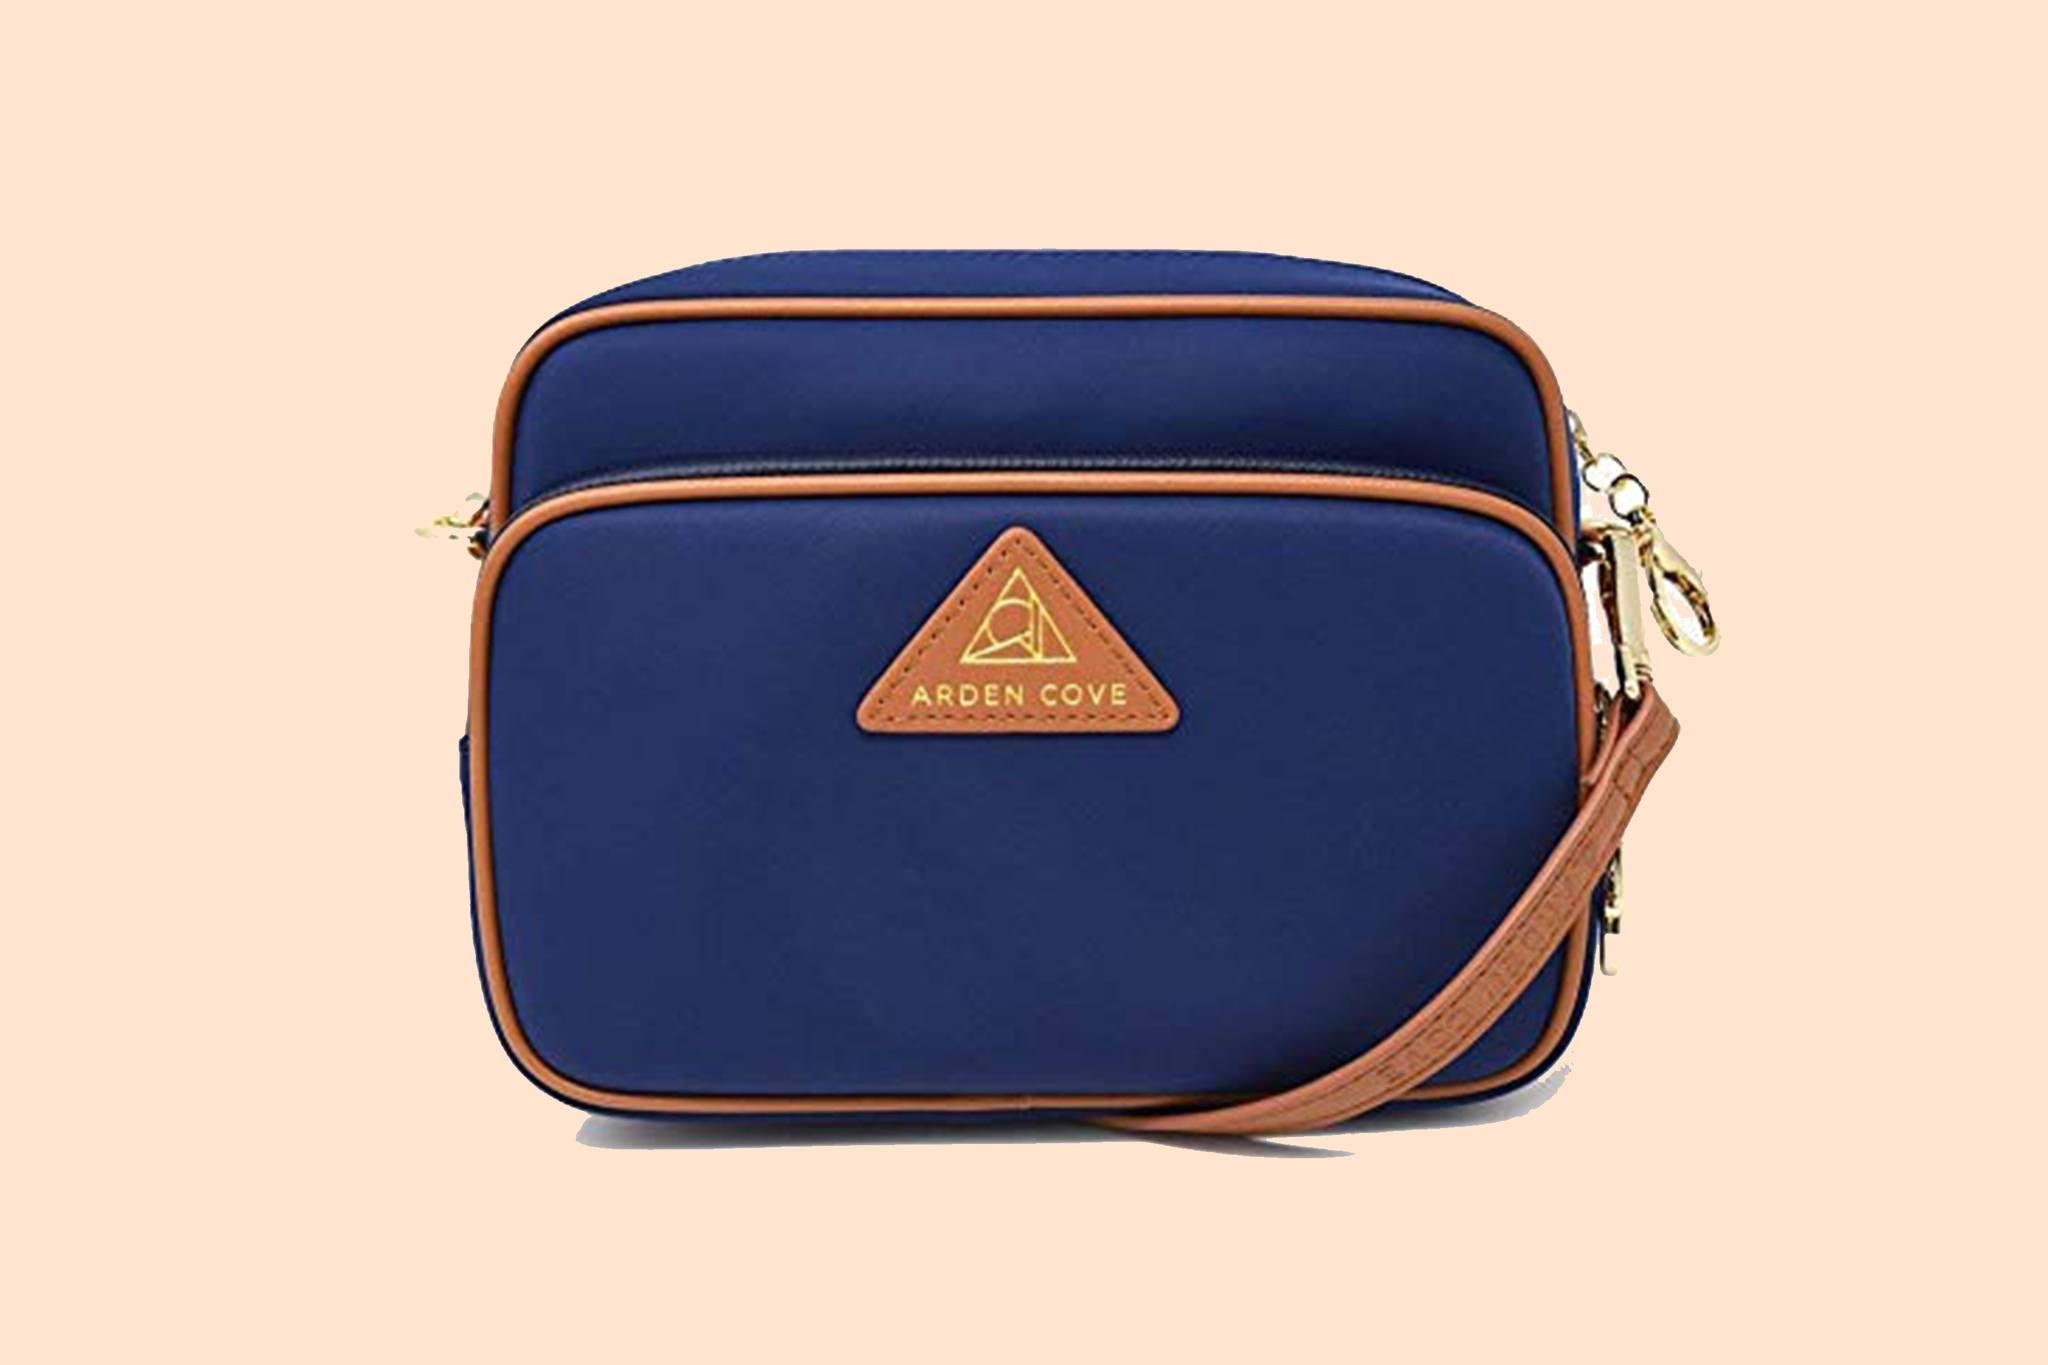 Arden Cove anti-theft purse